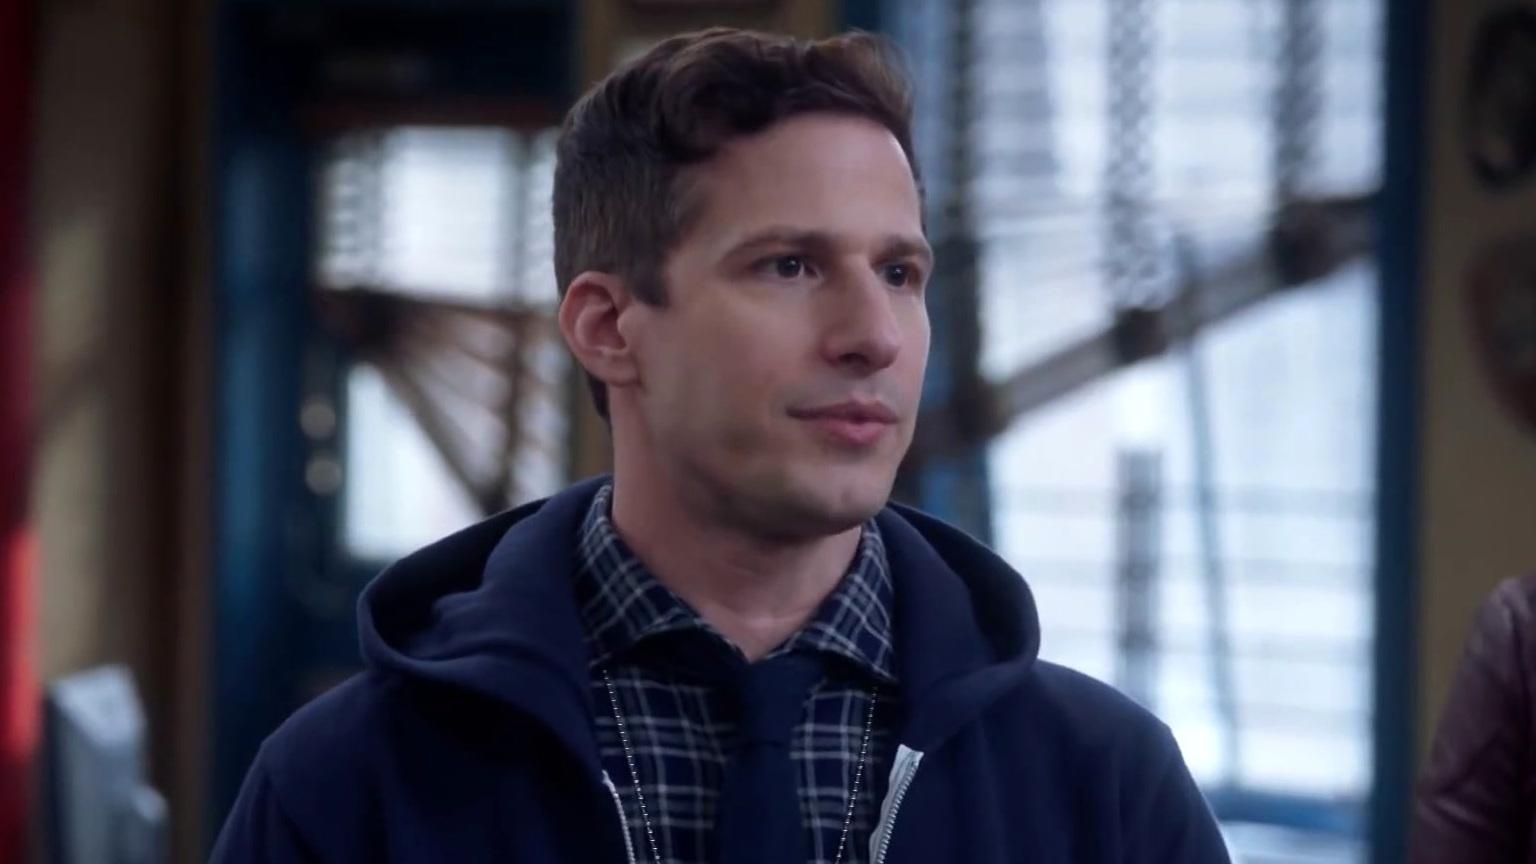 Brooklyn Nine-Nine: Holt Calls Dillman The Best Detective Ever